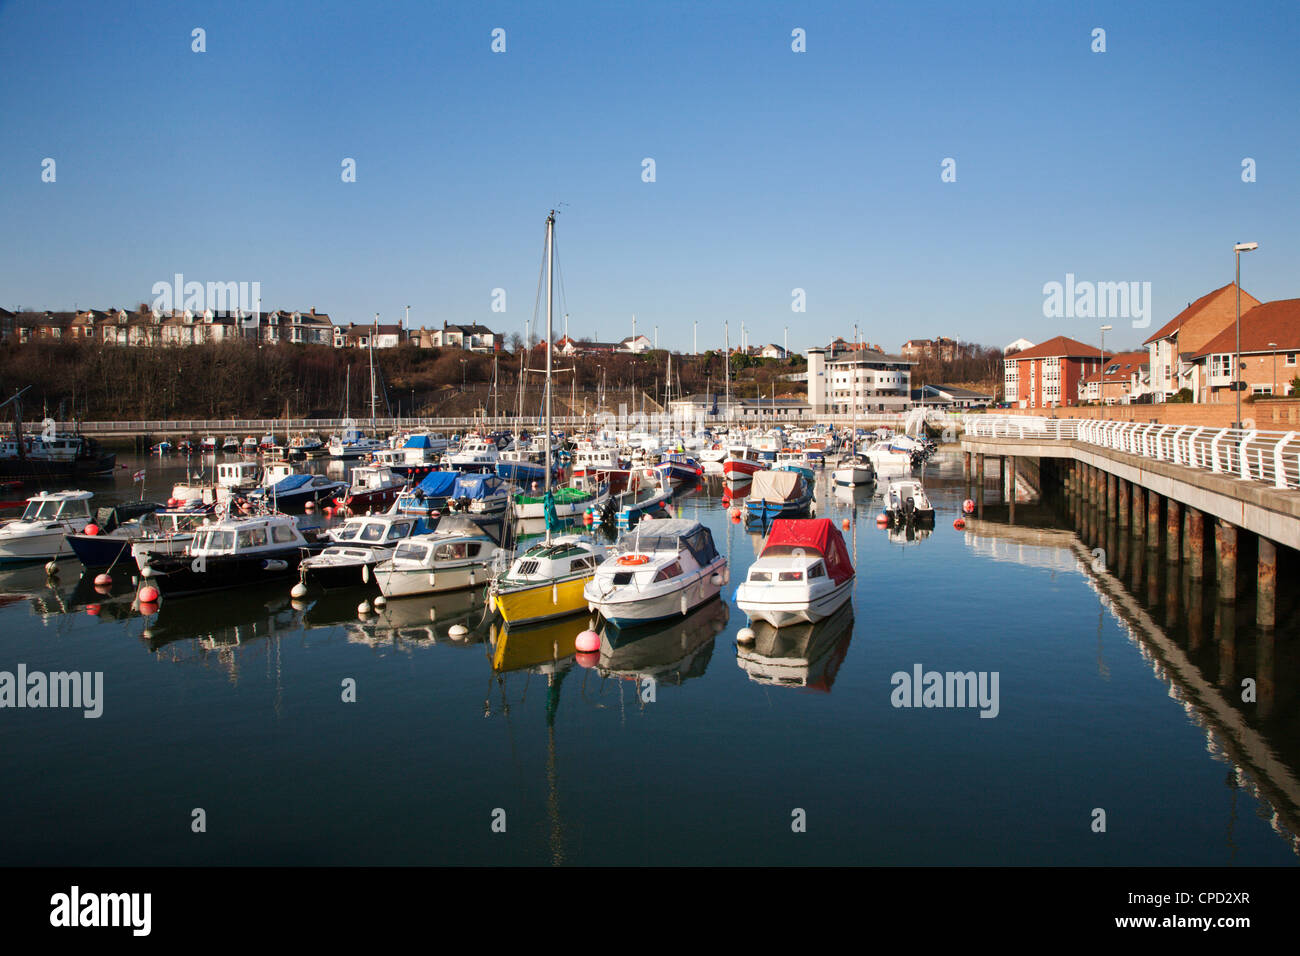 Sunderland Marina, Sunderland, Tyne and Wear, England, Regno Unito, Europa Immagini Stock